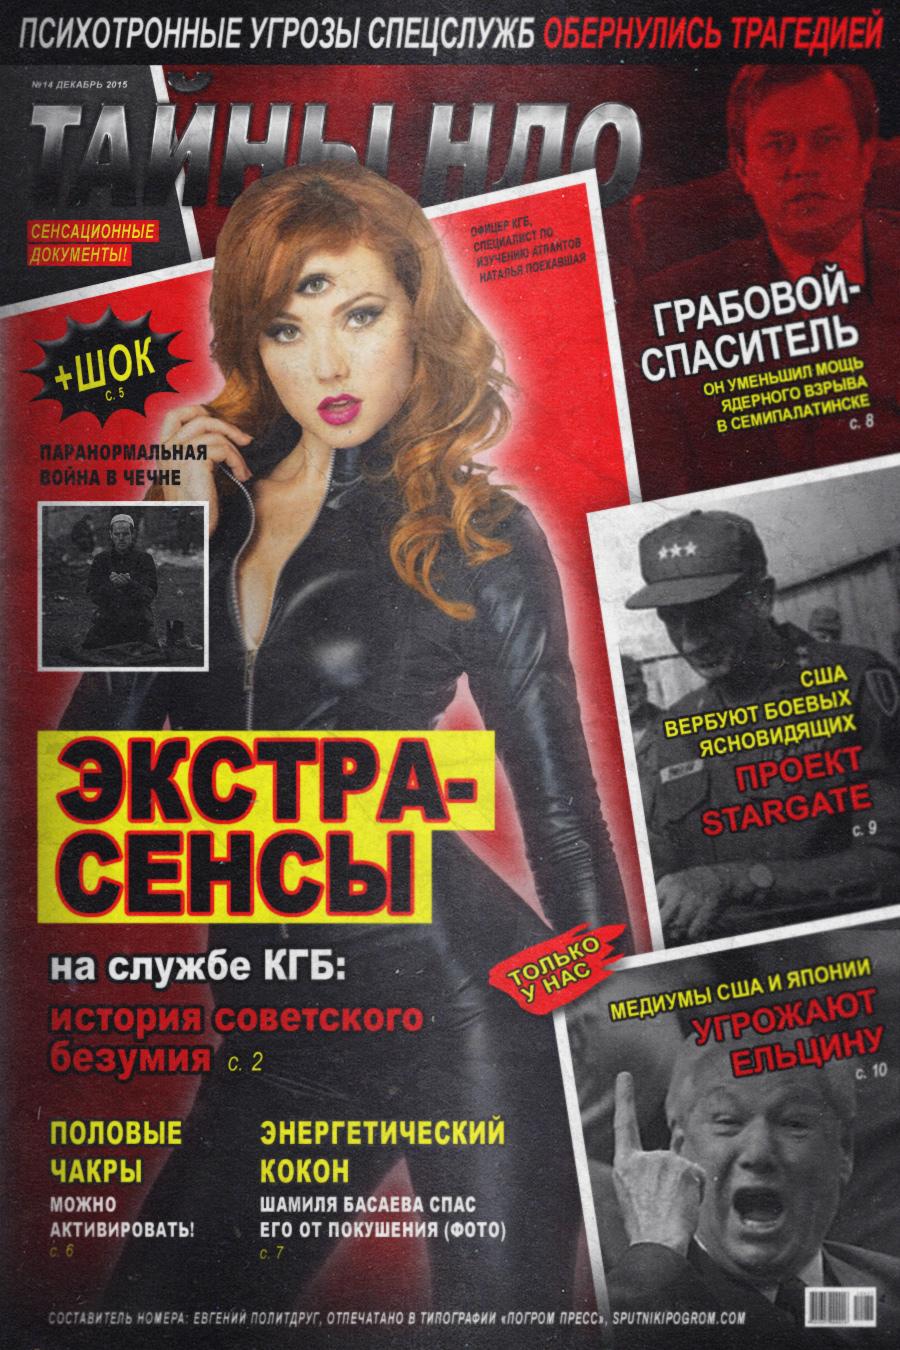 kgb-cover-v2